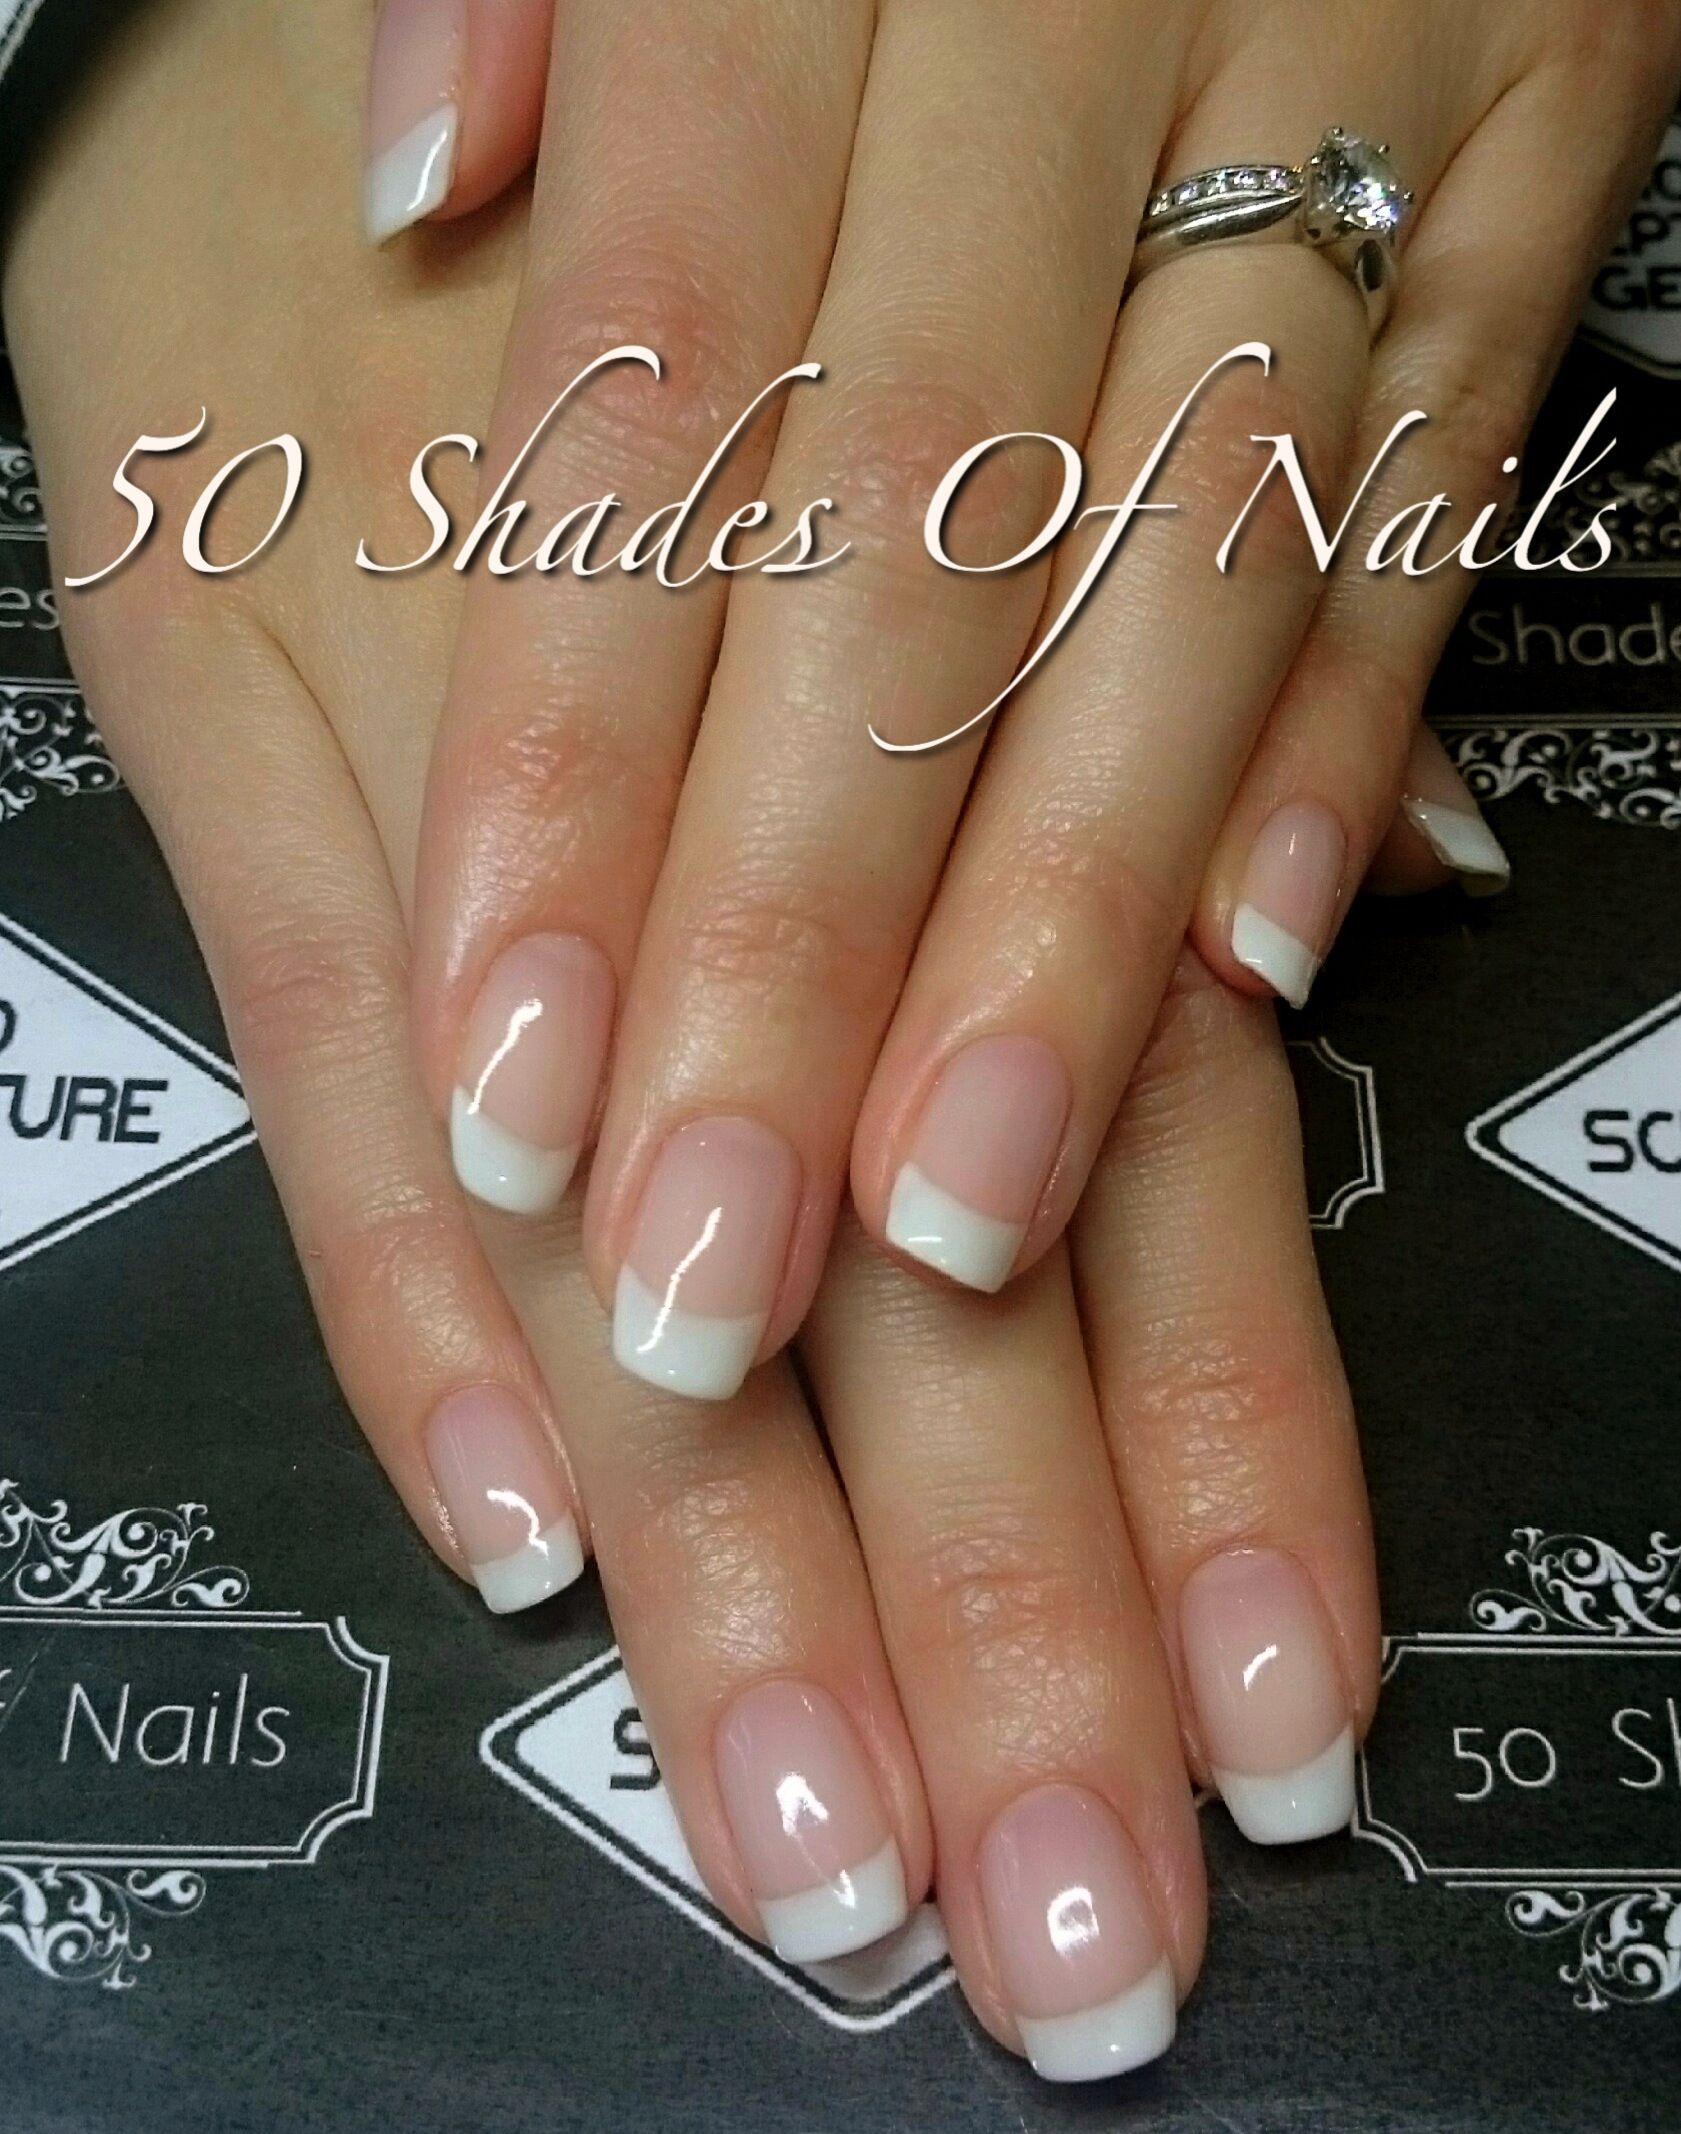 Bio Sculpture Gel French Manicure Gel Nails French Manicure Acrylic Nails Gel French Manicure